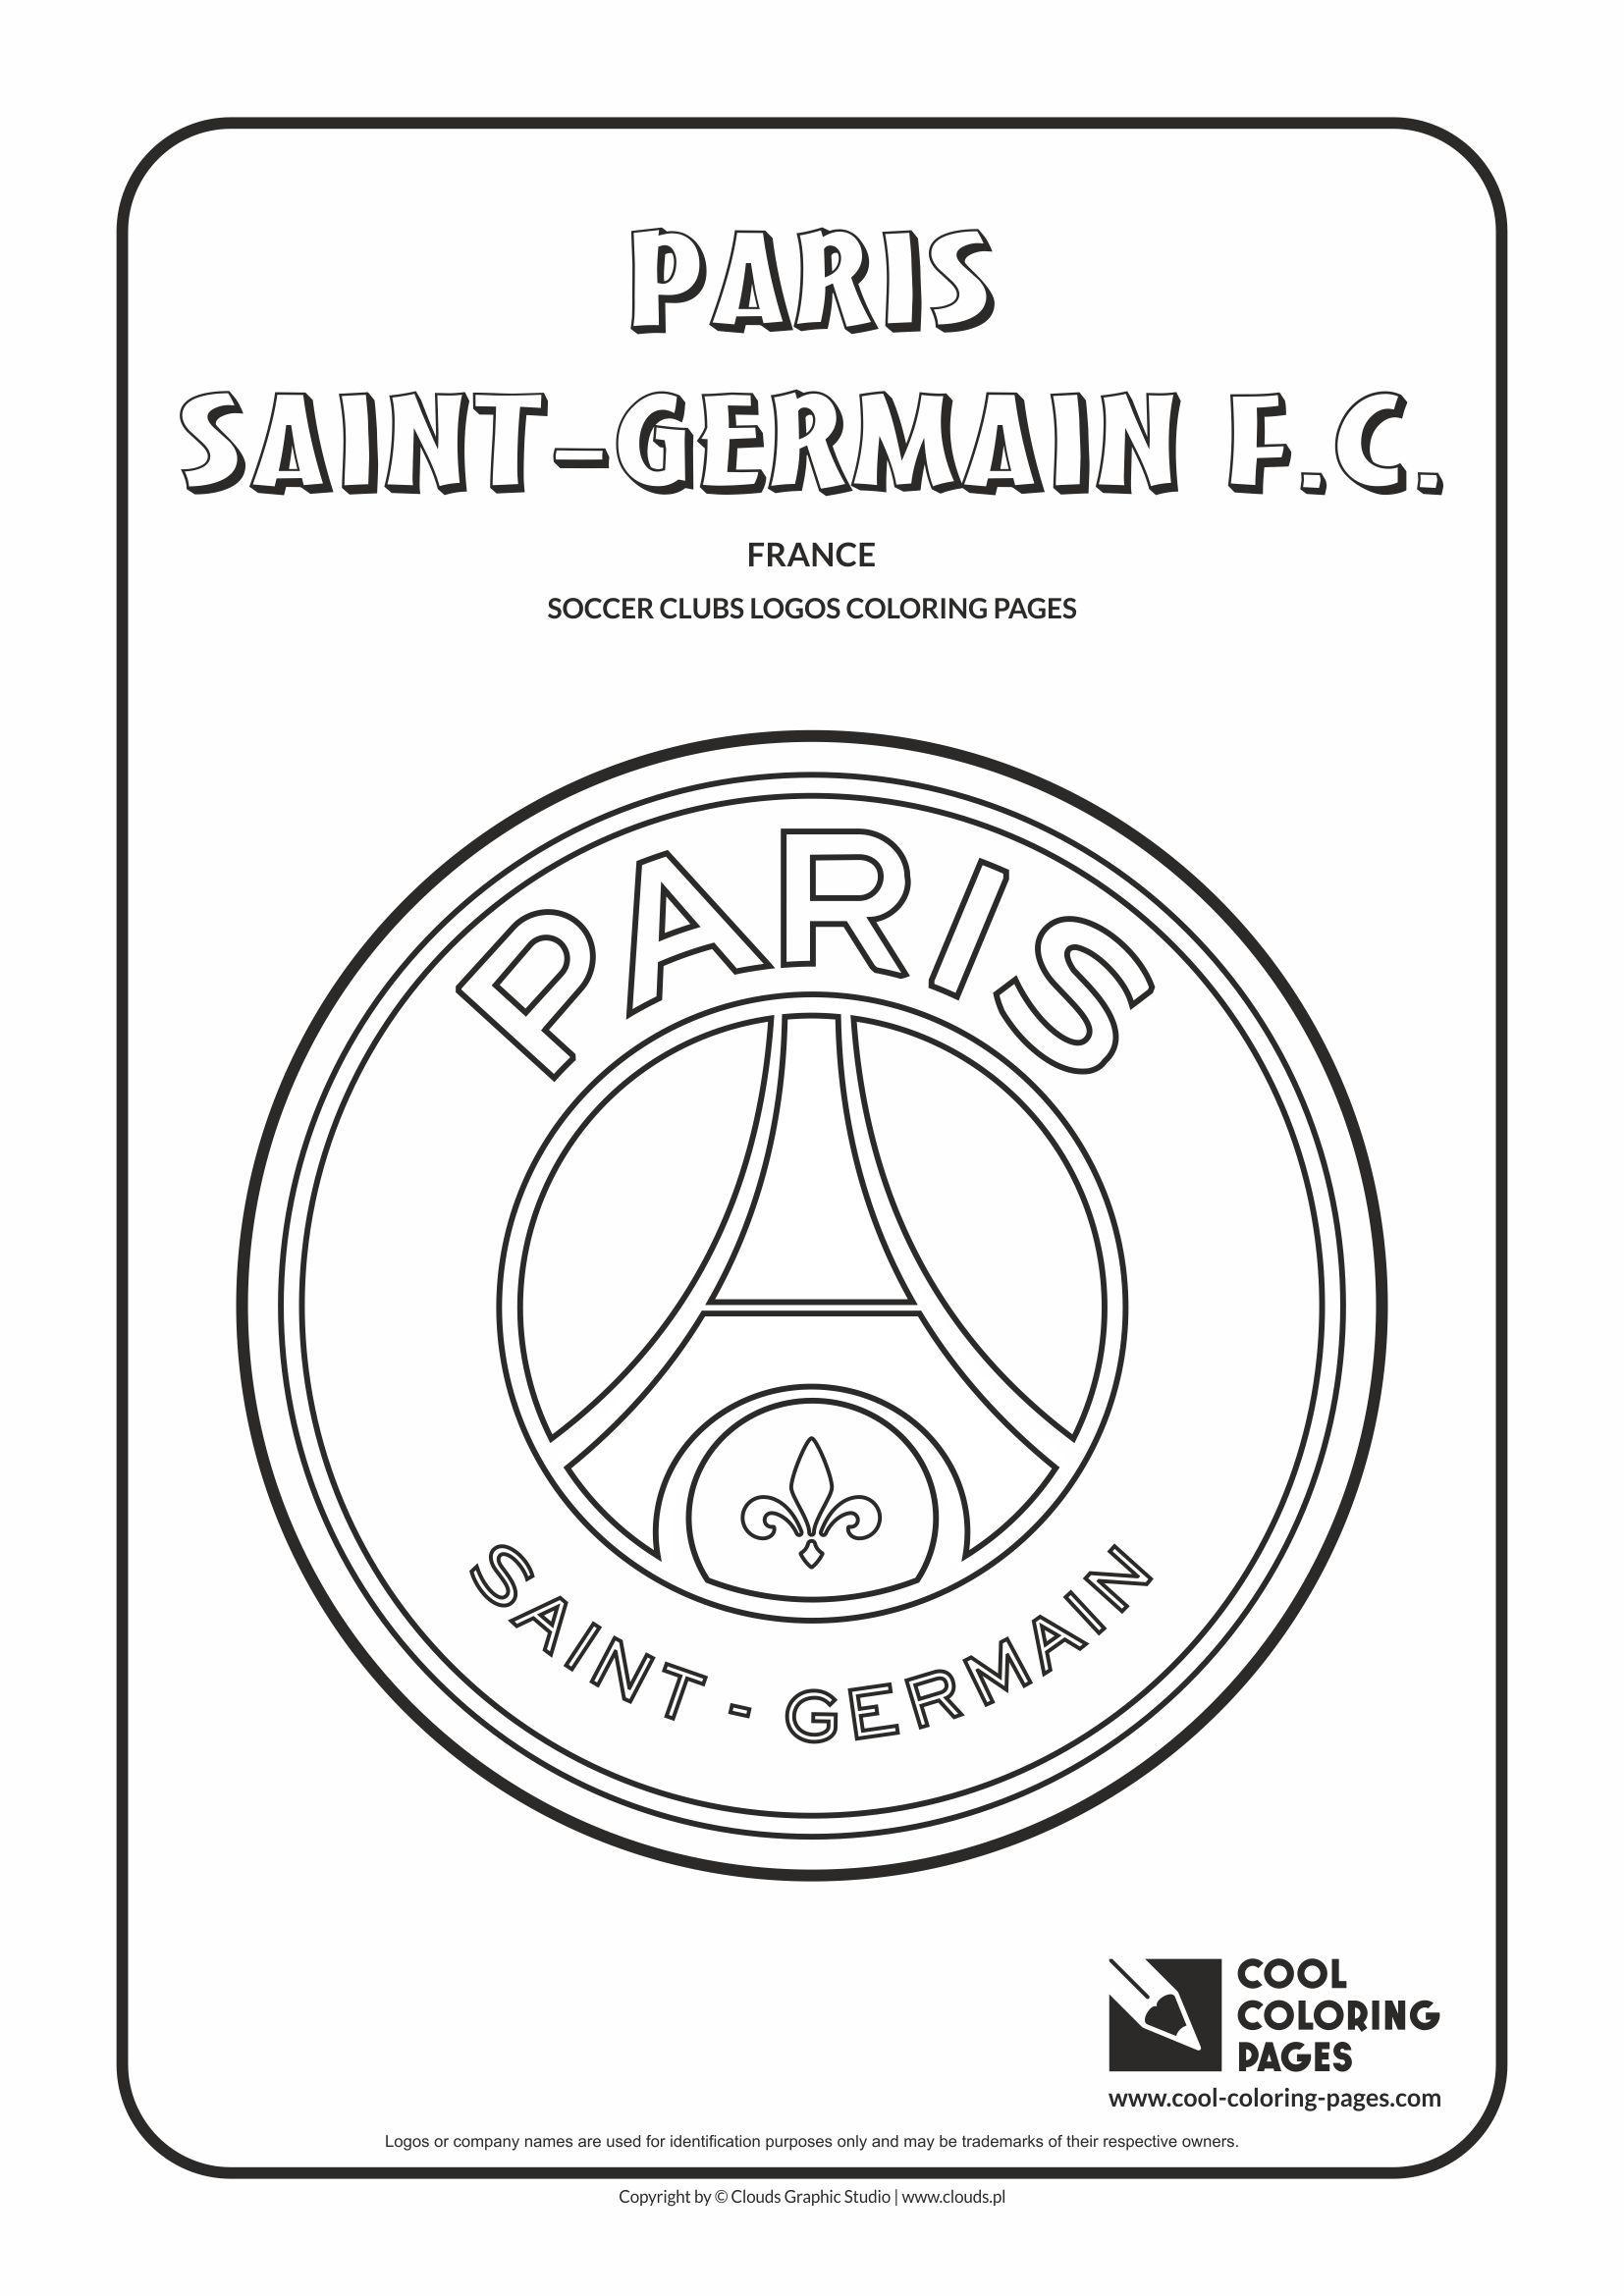 Cool Coloring Pages - Soccer Clubs Logos / Paris Saint-Germain ...